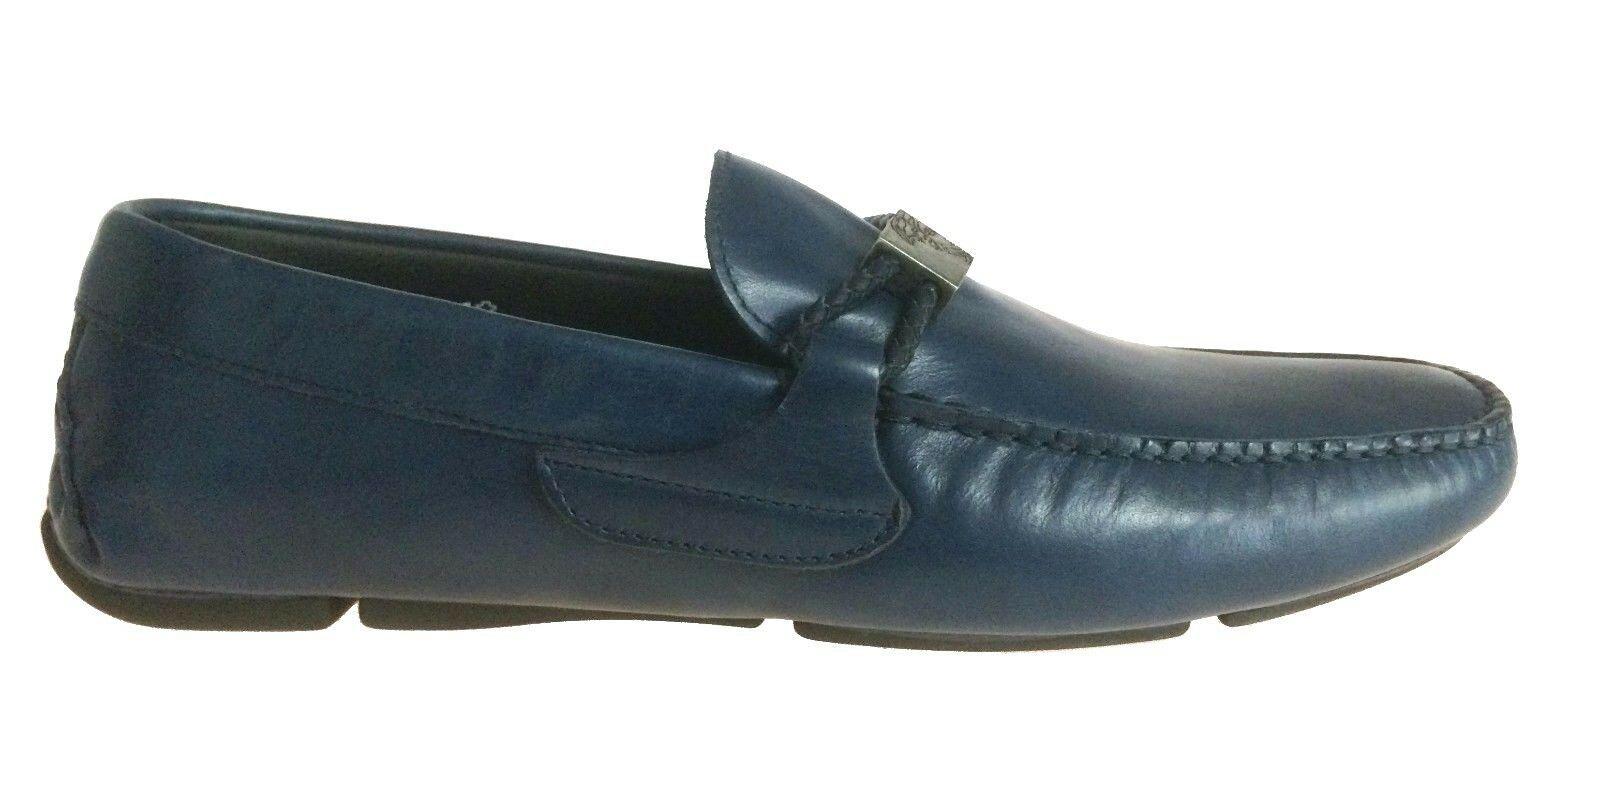 Versace PCS Unique Leather Driving Shoes V900545 v346v  - $365.00